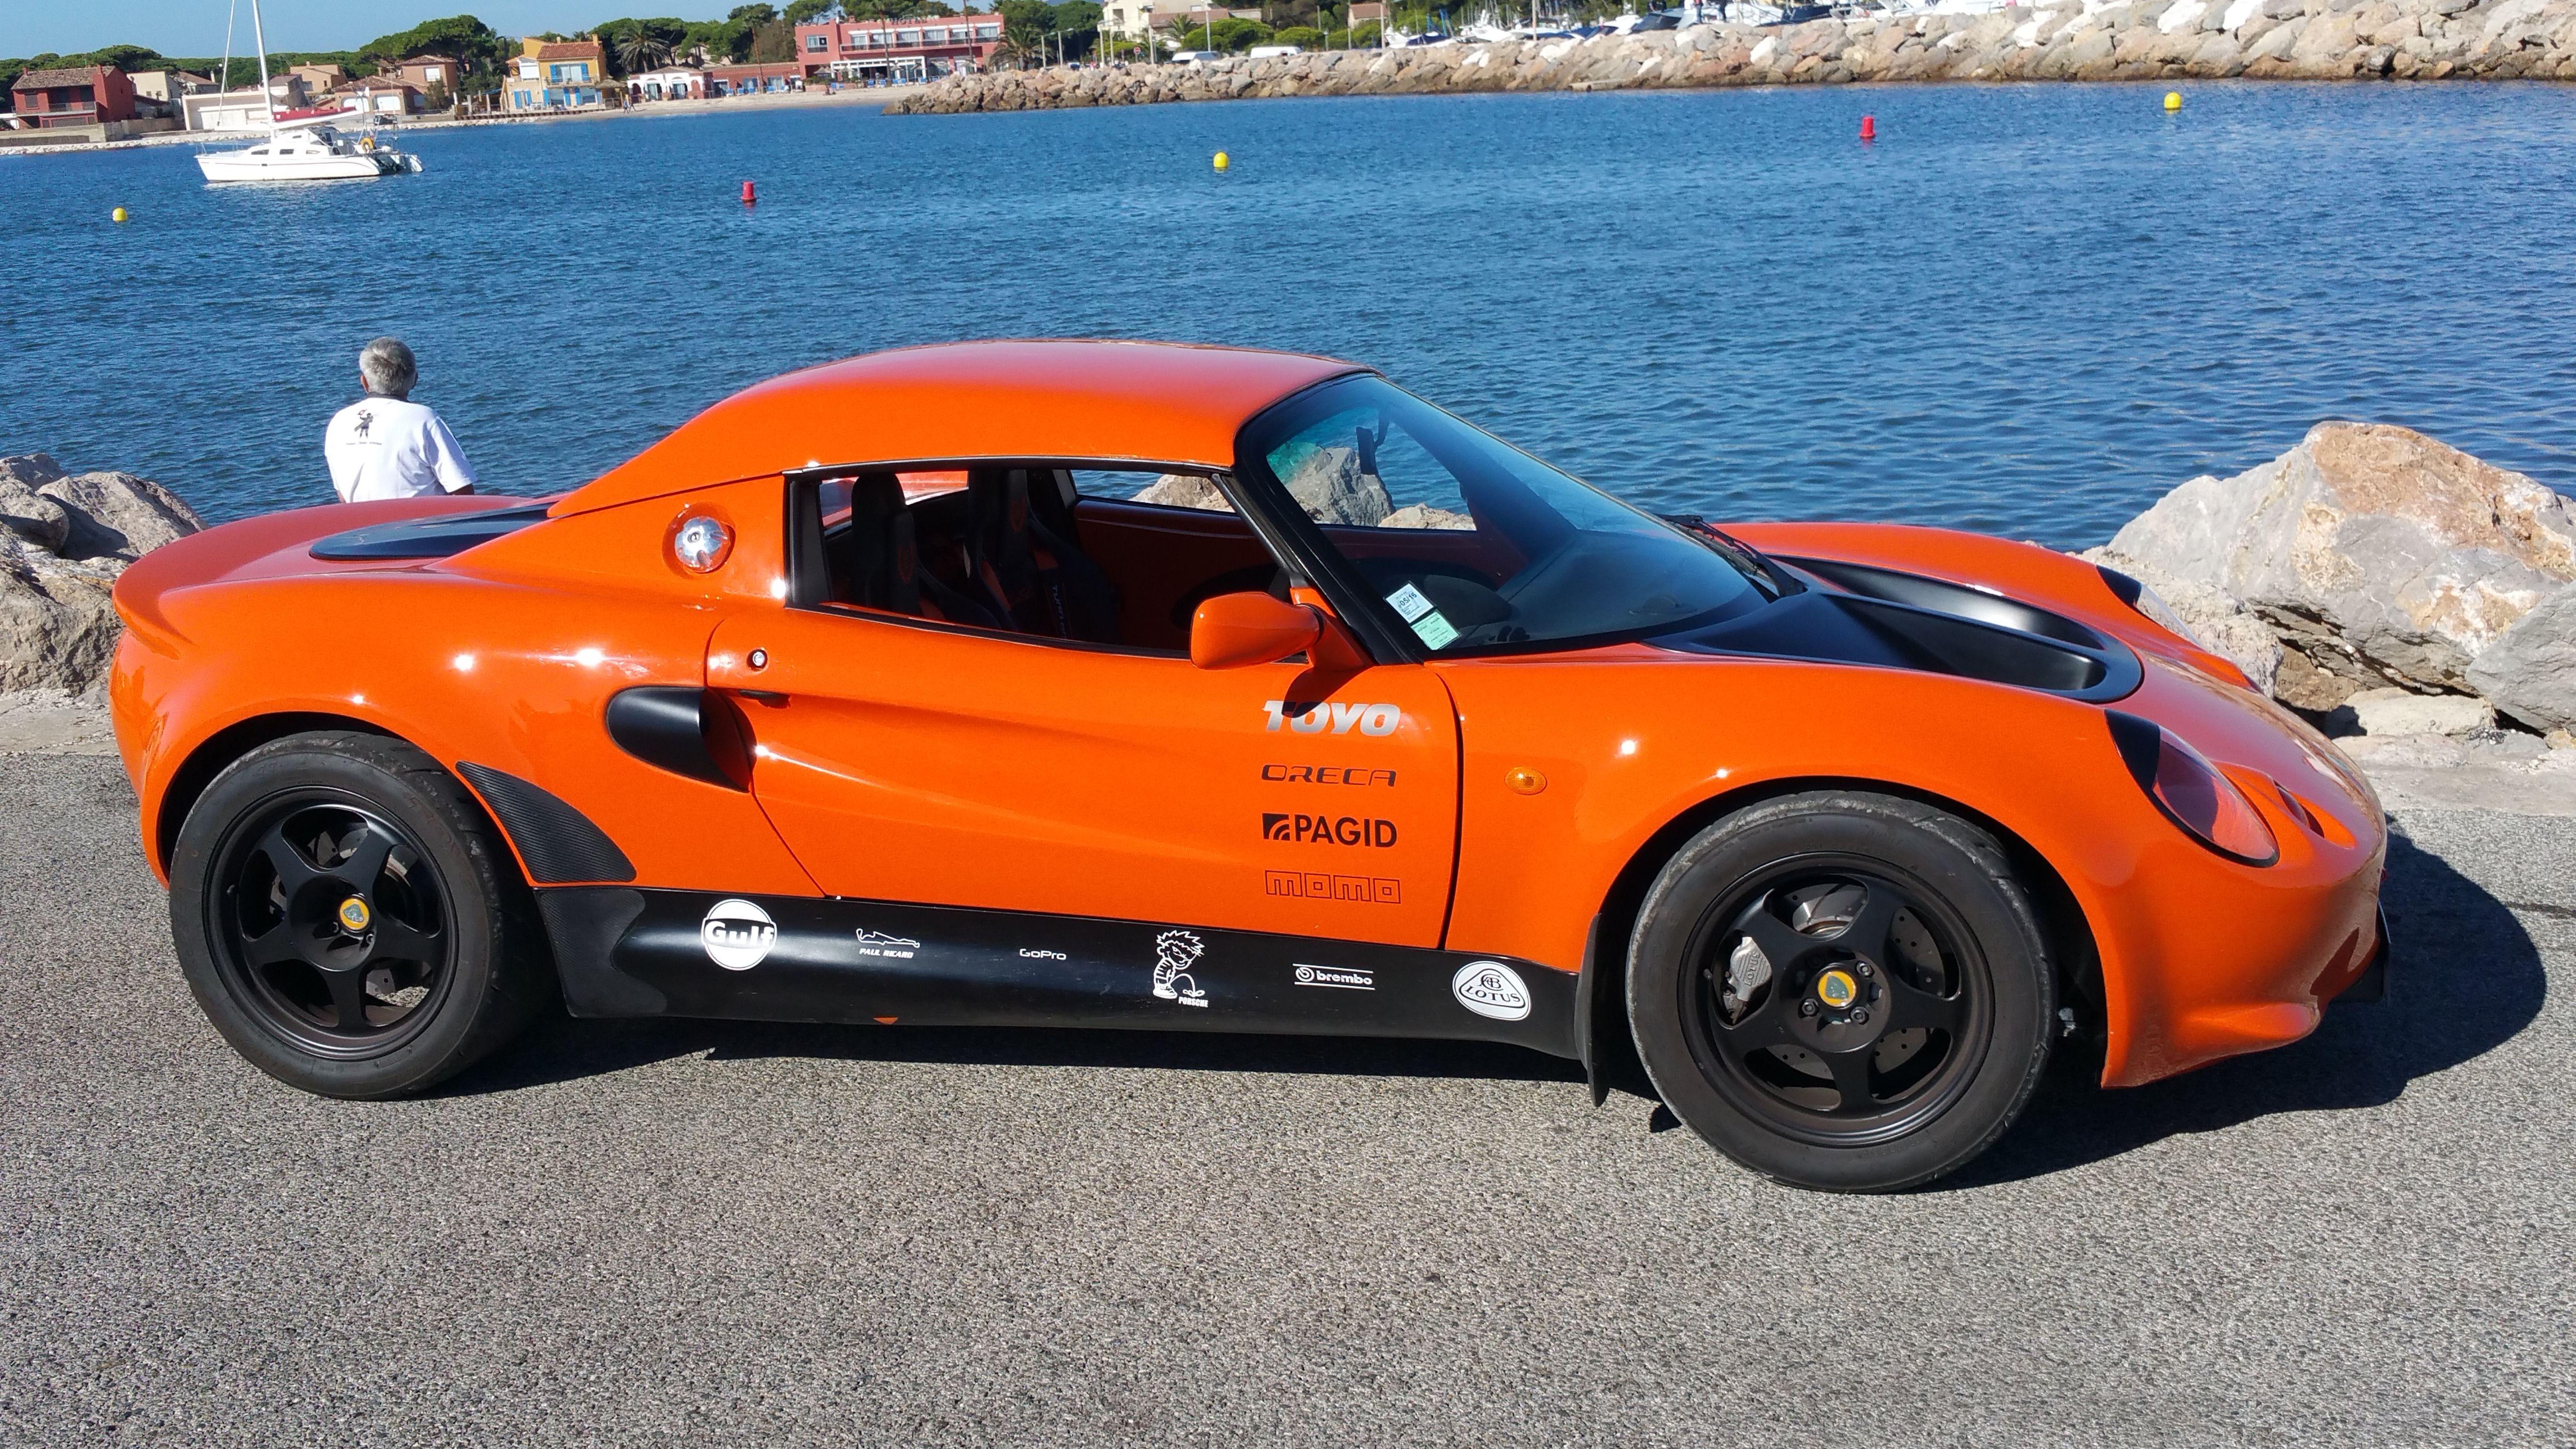 Marvelous Lotus Elise S1 111 S